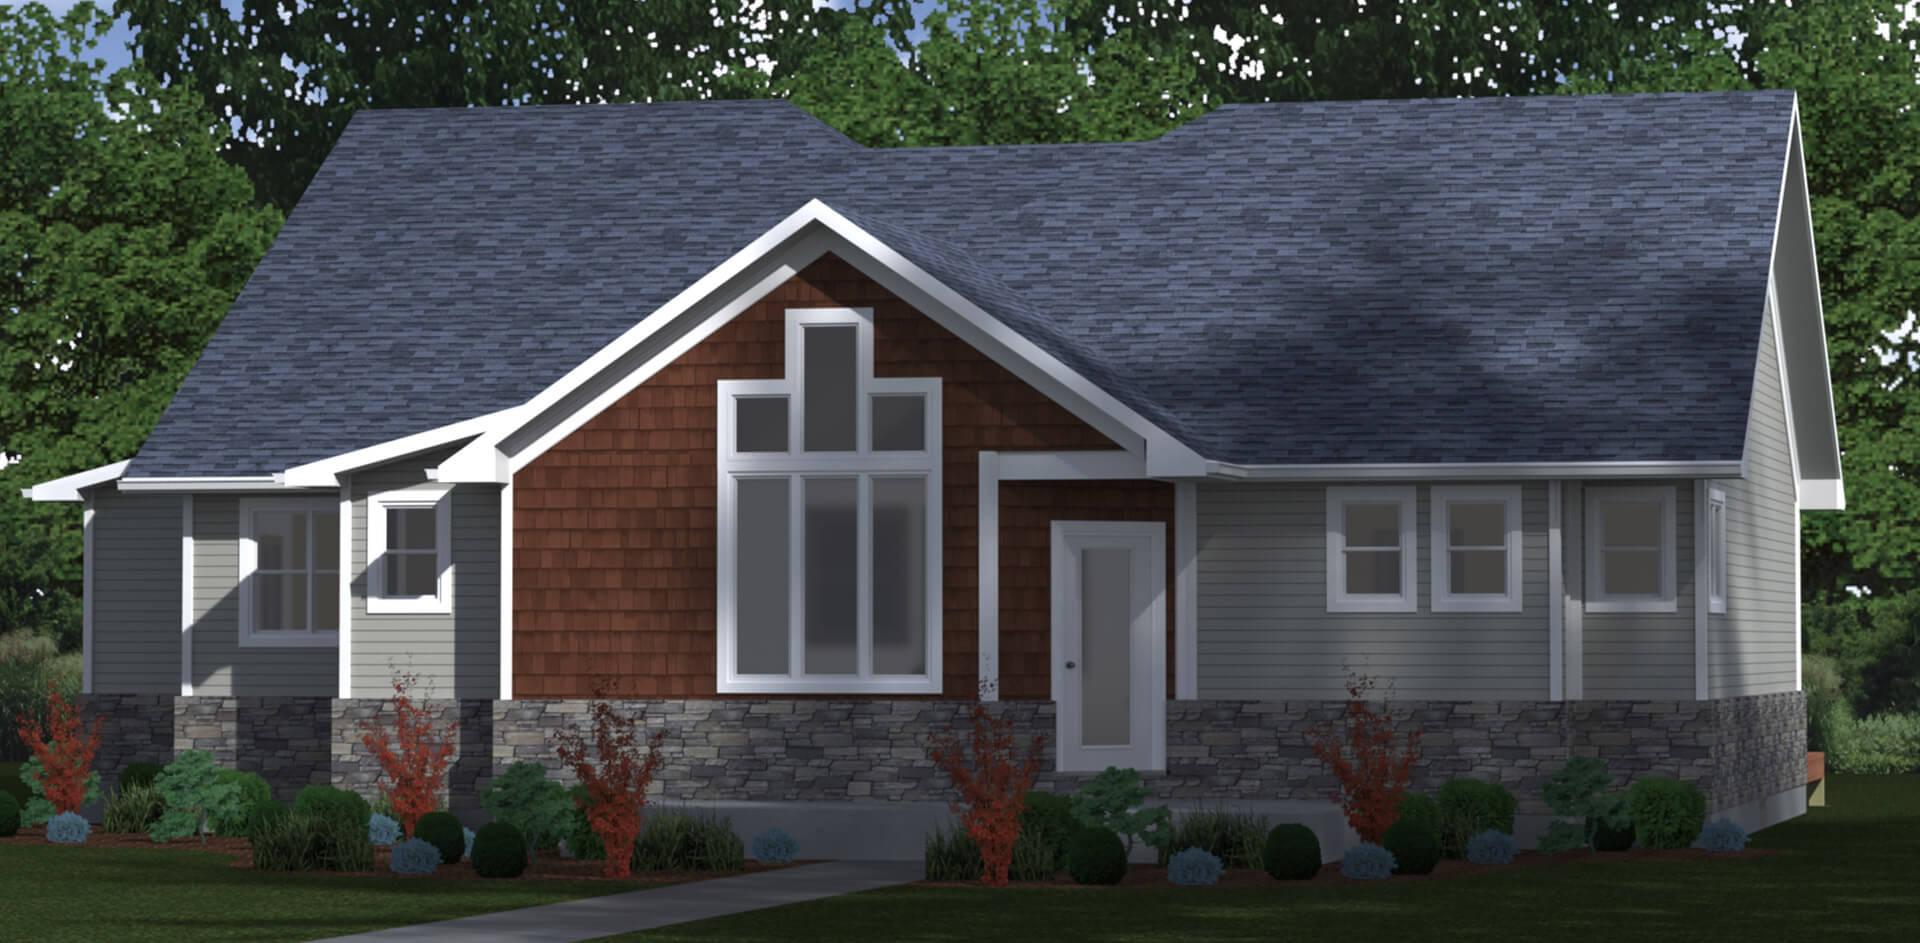 1822 house elevation